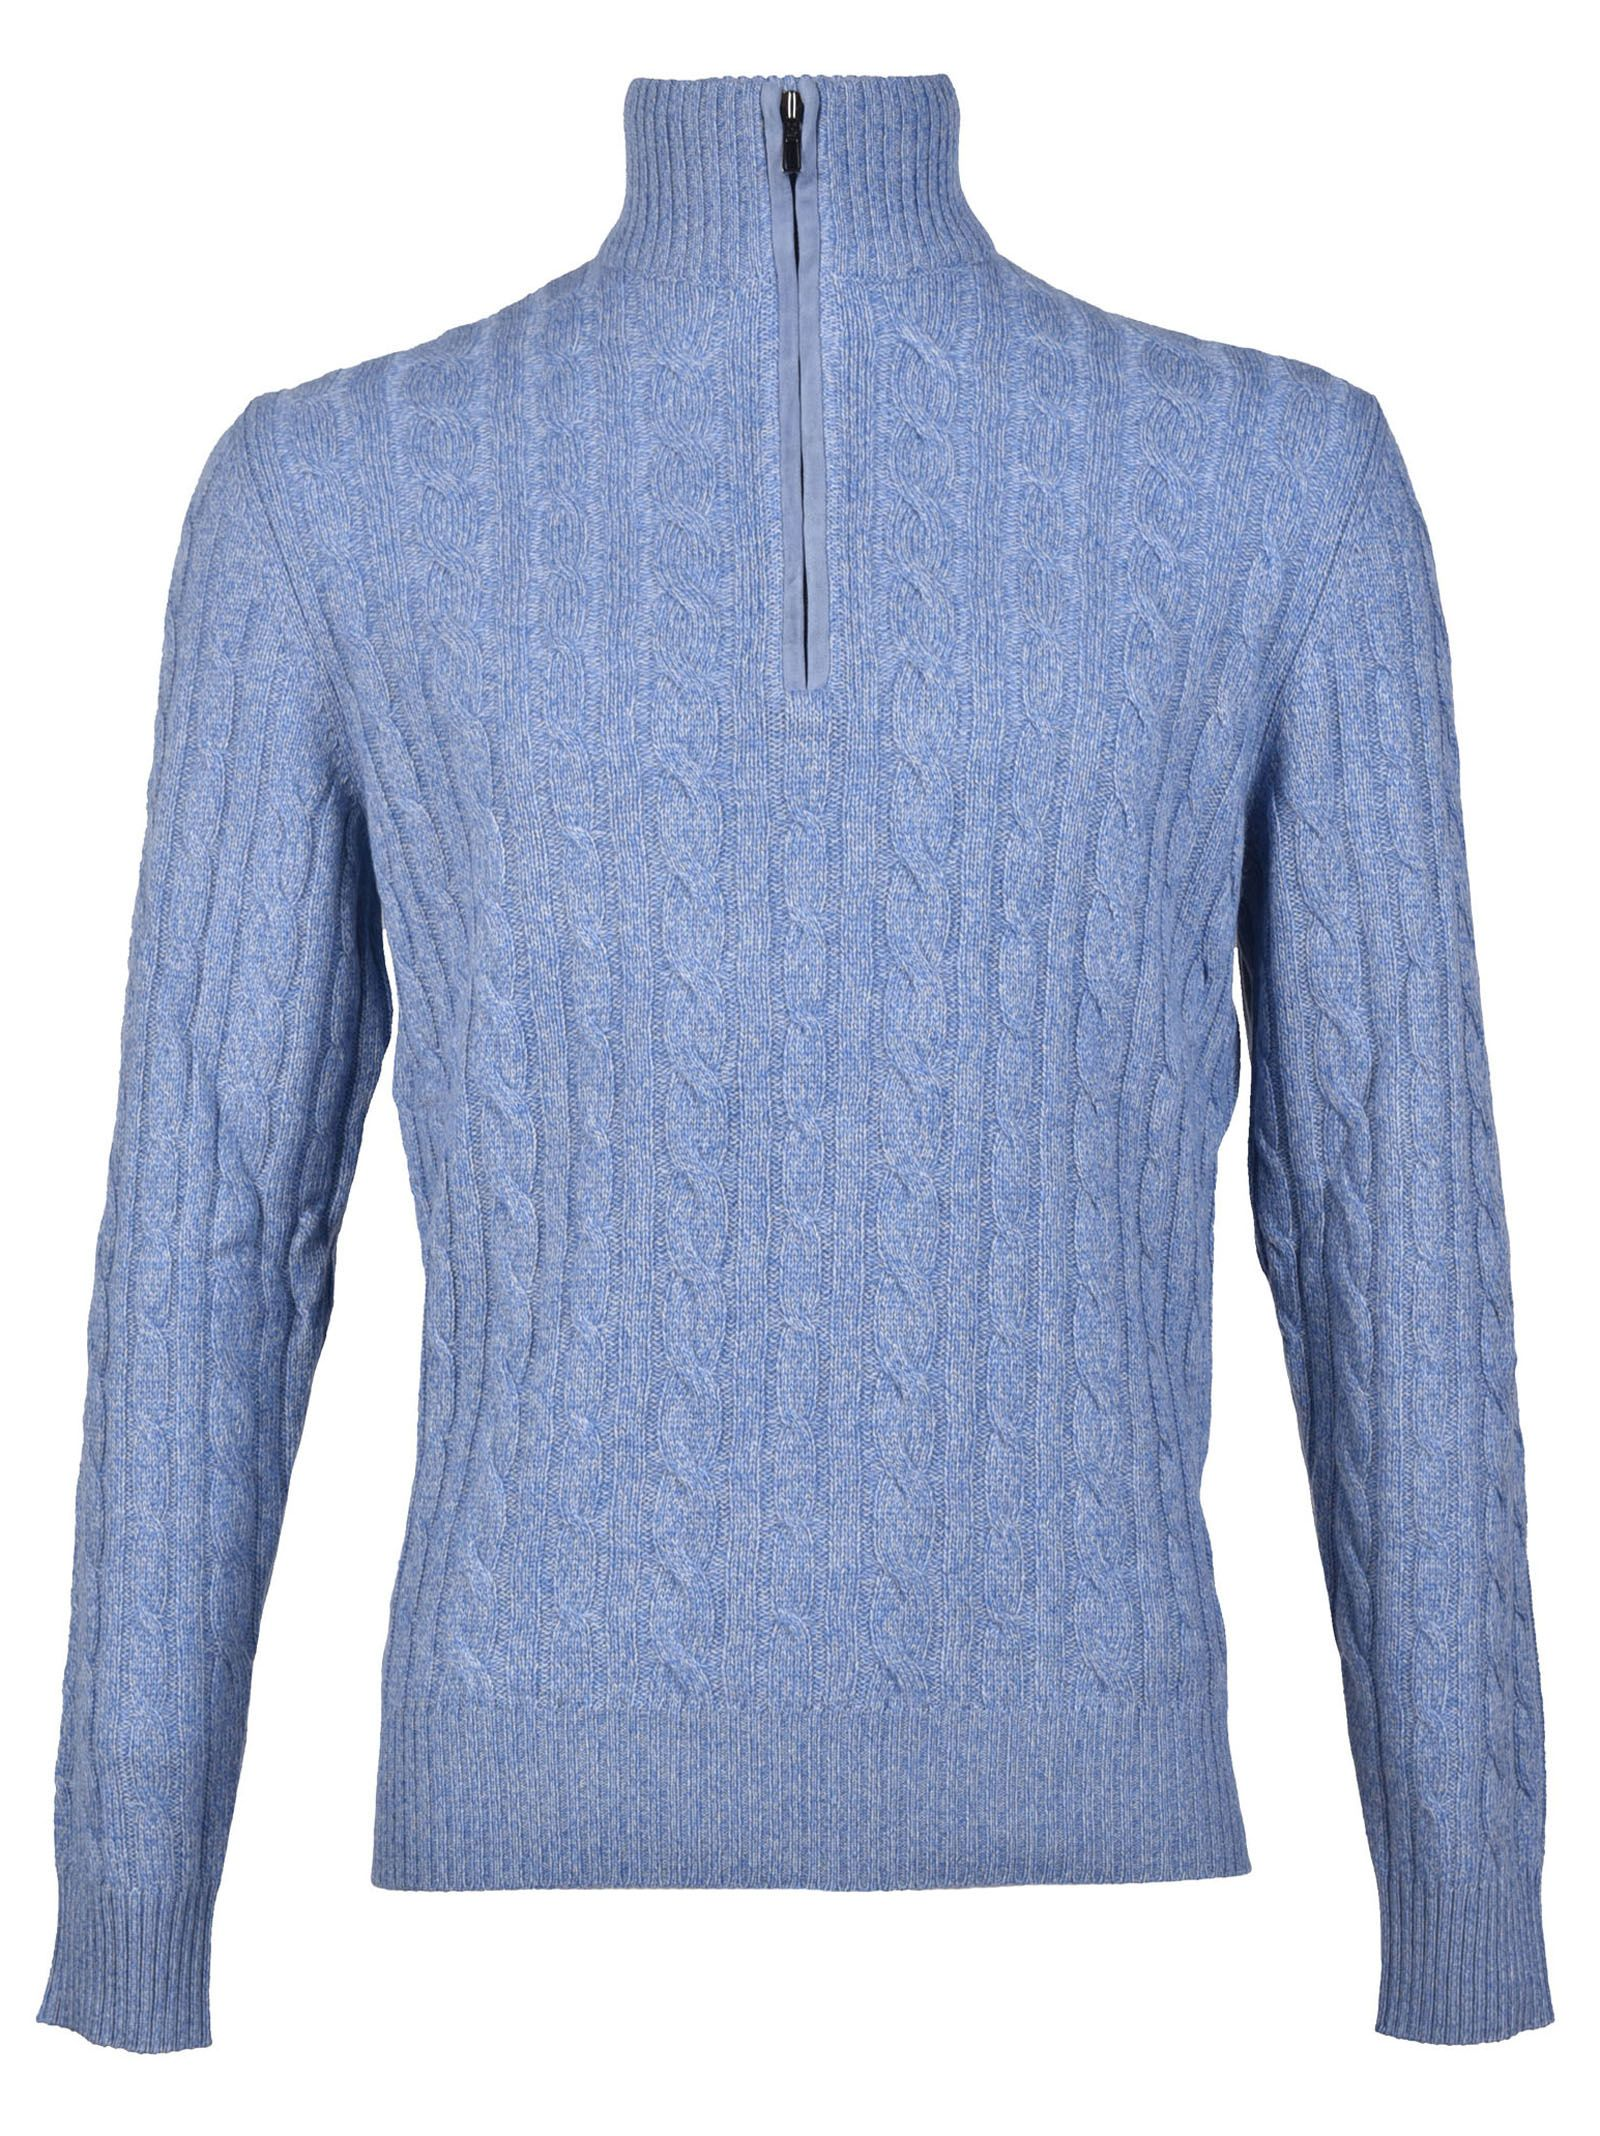 Loro Piana - Loro Piana Braid Sweater - Sky Blue, Men's Sweaters ...